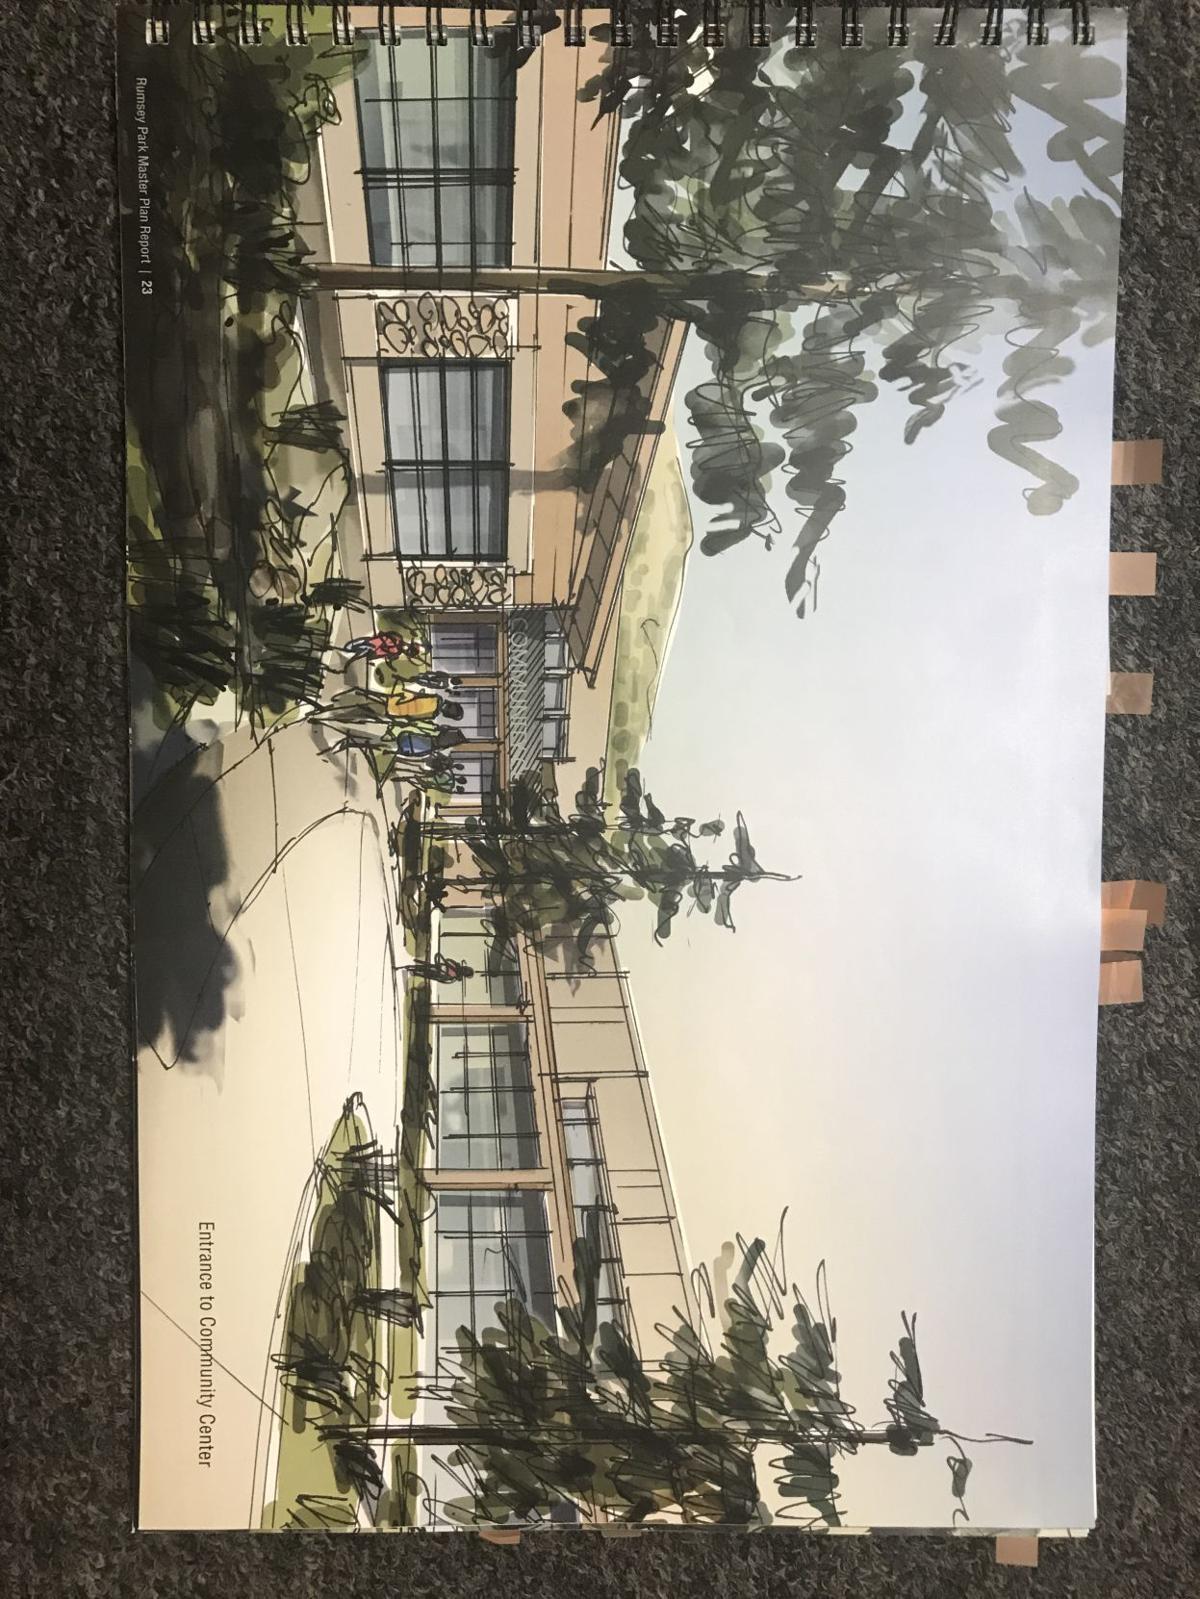 Proposed Community Center for MHA Foundaiton